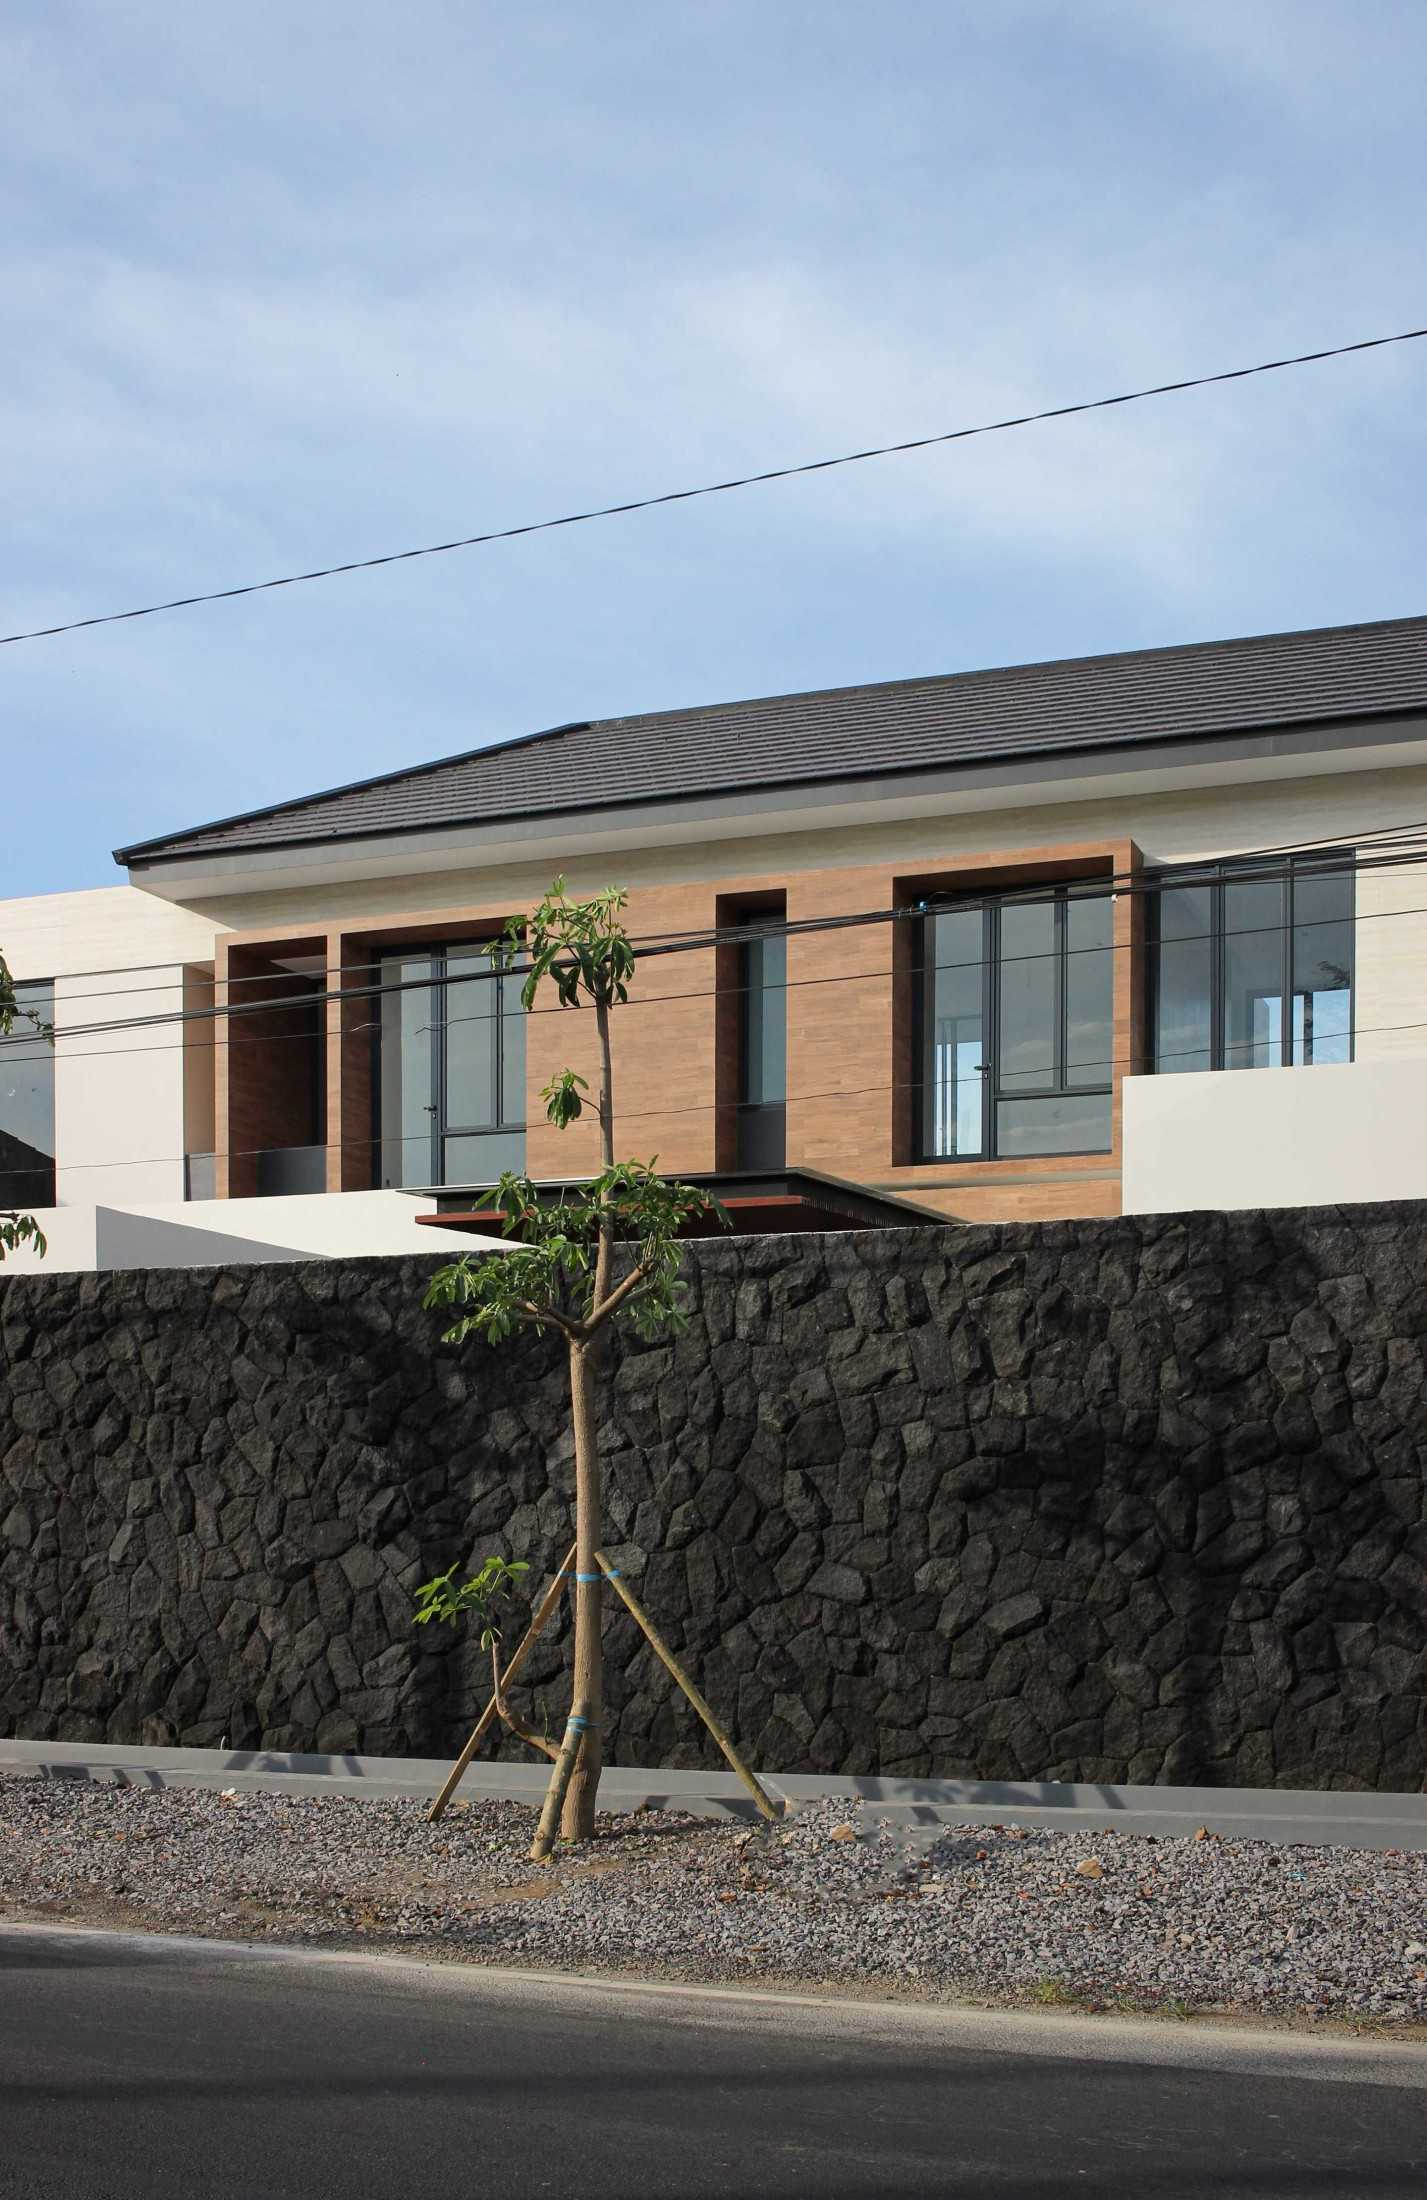 Y0 Design Architect S House Kec. Srono, Kabupaten Banyuwangi, Jawa Timur, Indonesia Kec. Srono, Kabupaten Banyuwangi, Jawa Timur, Indonesia Yohanes-Iswara-Limandjaya-S-House  121074